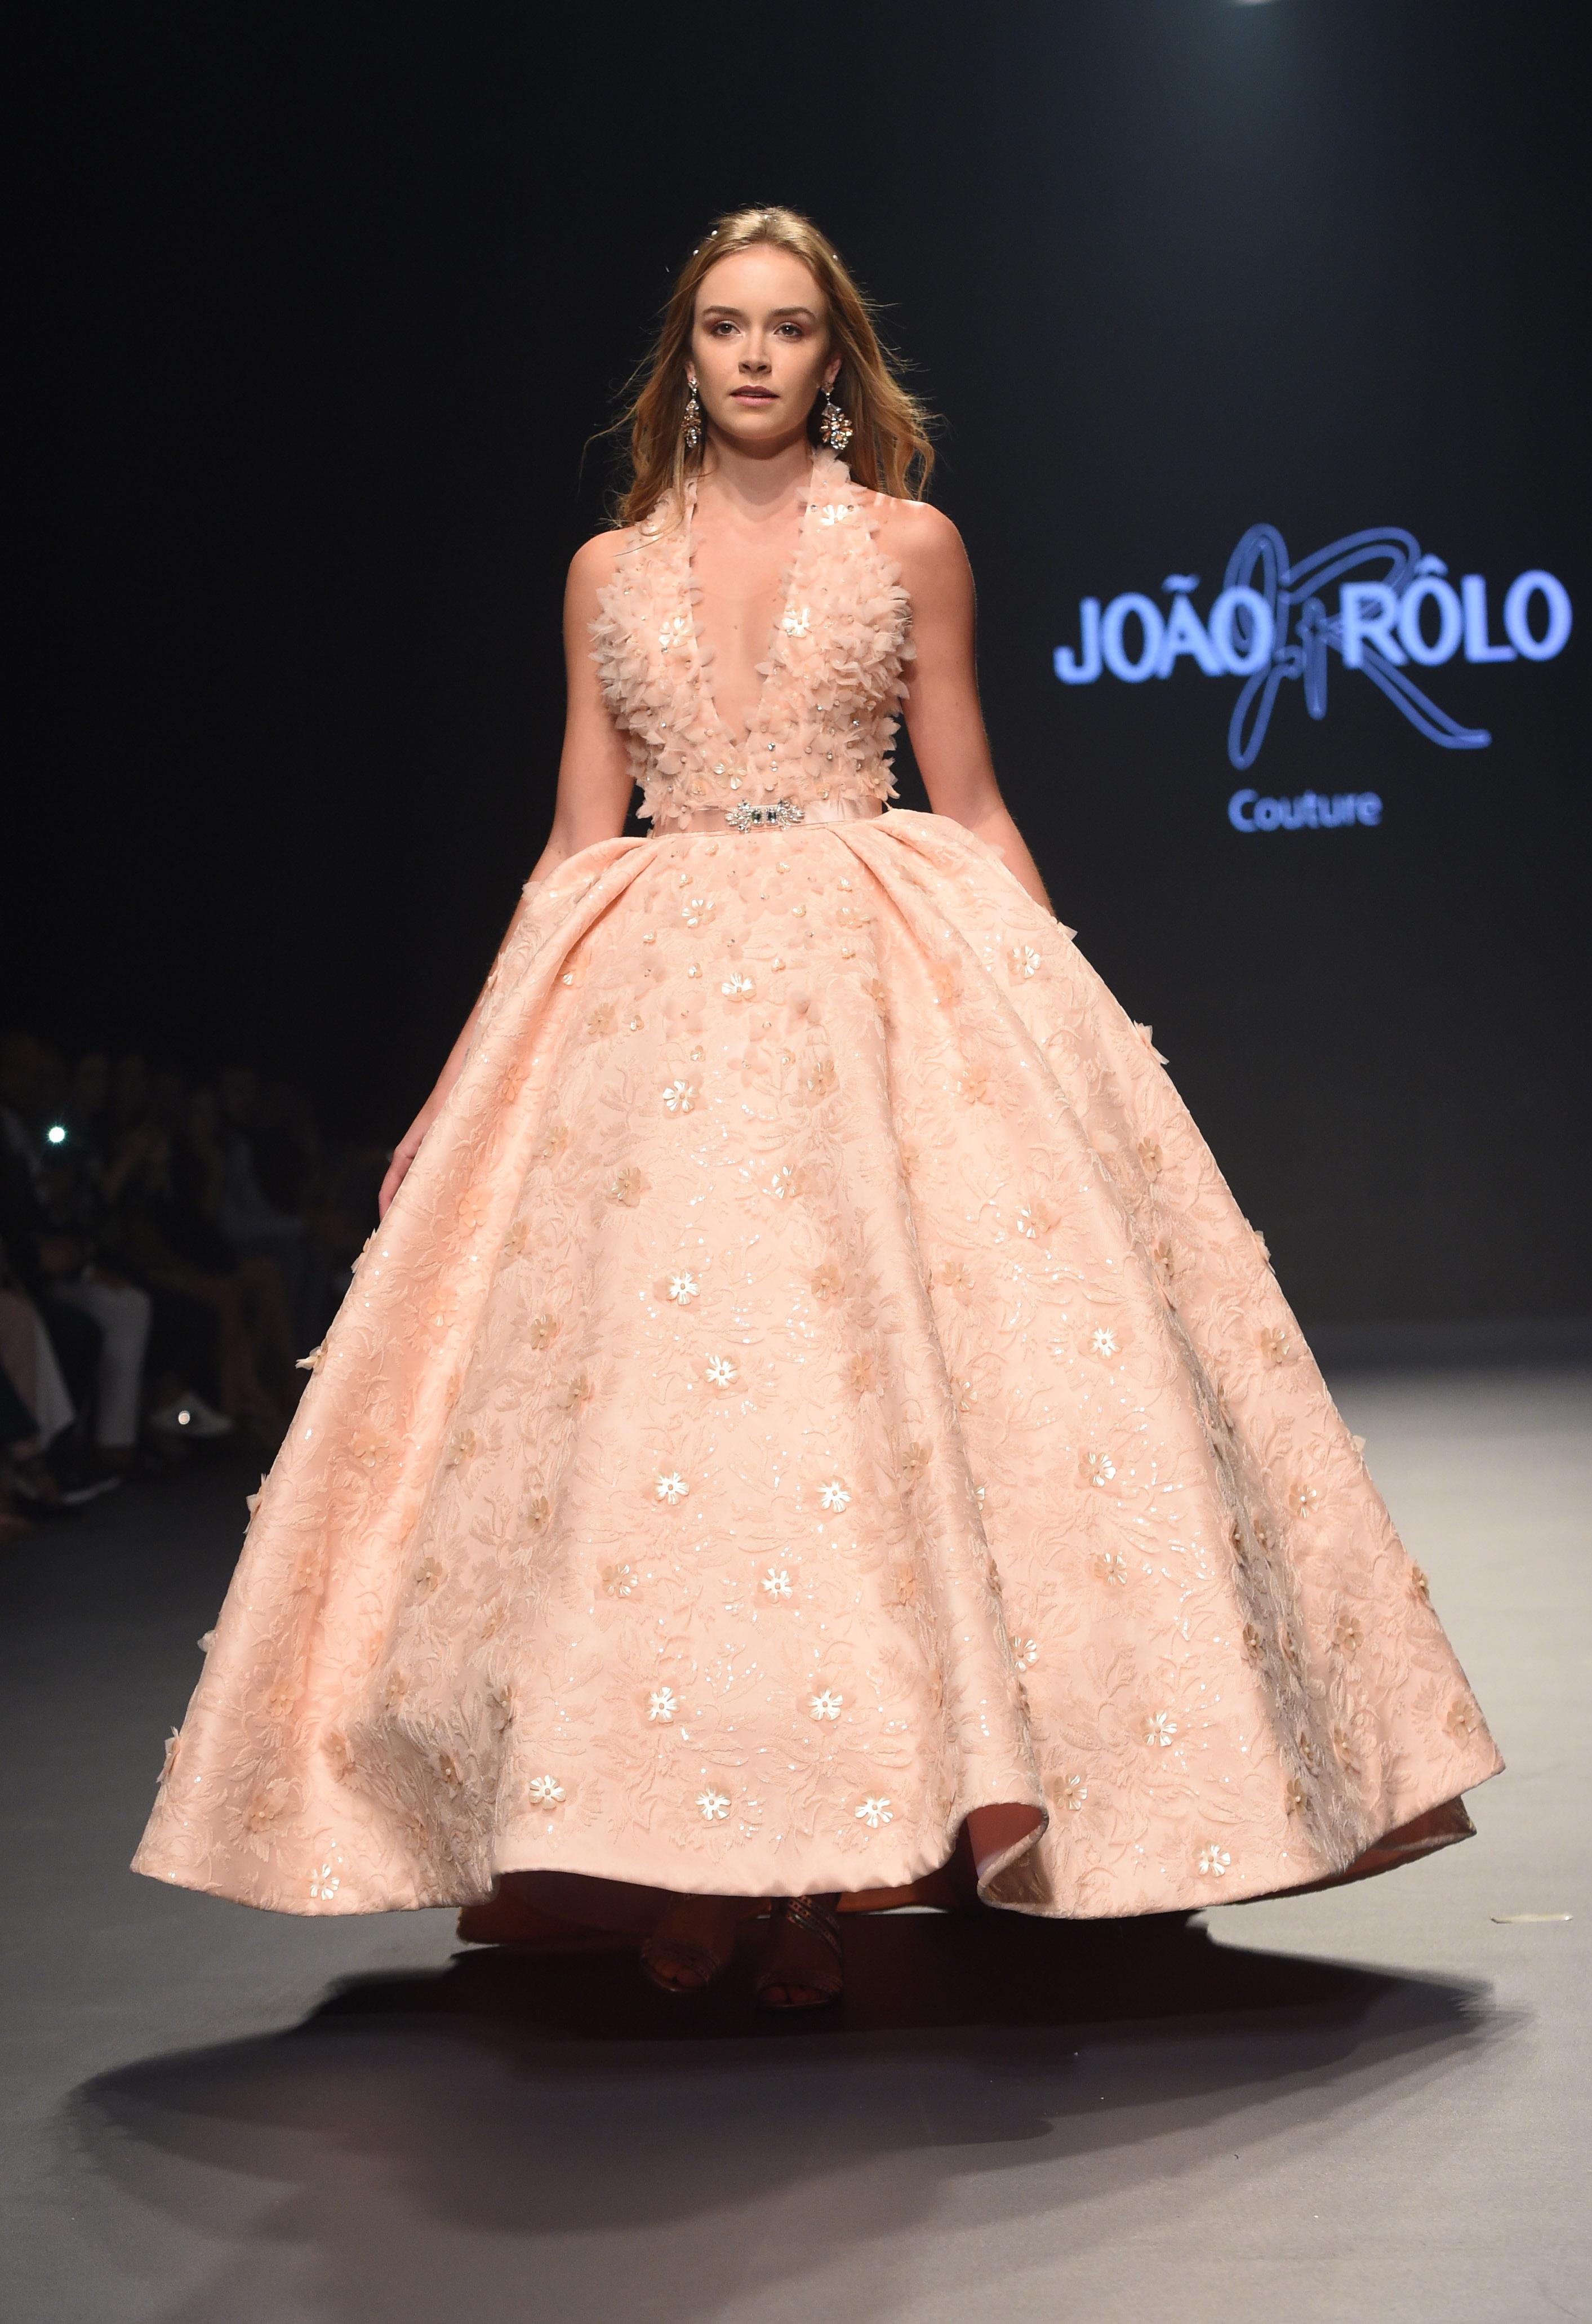 Joao Rolo International - Fashion Forward Dubai Season 10, October 2017 - Photography by Stuart C. Wilson, Getty Images